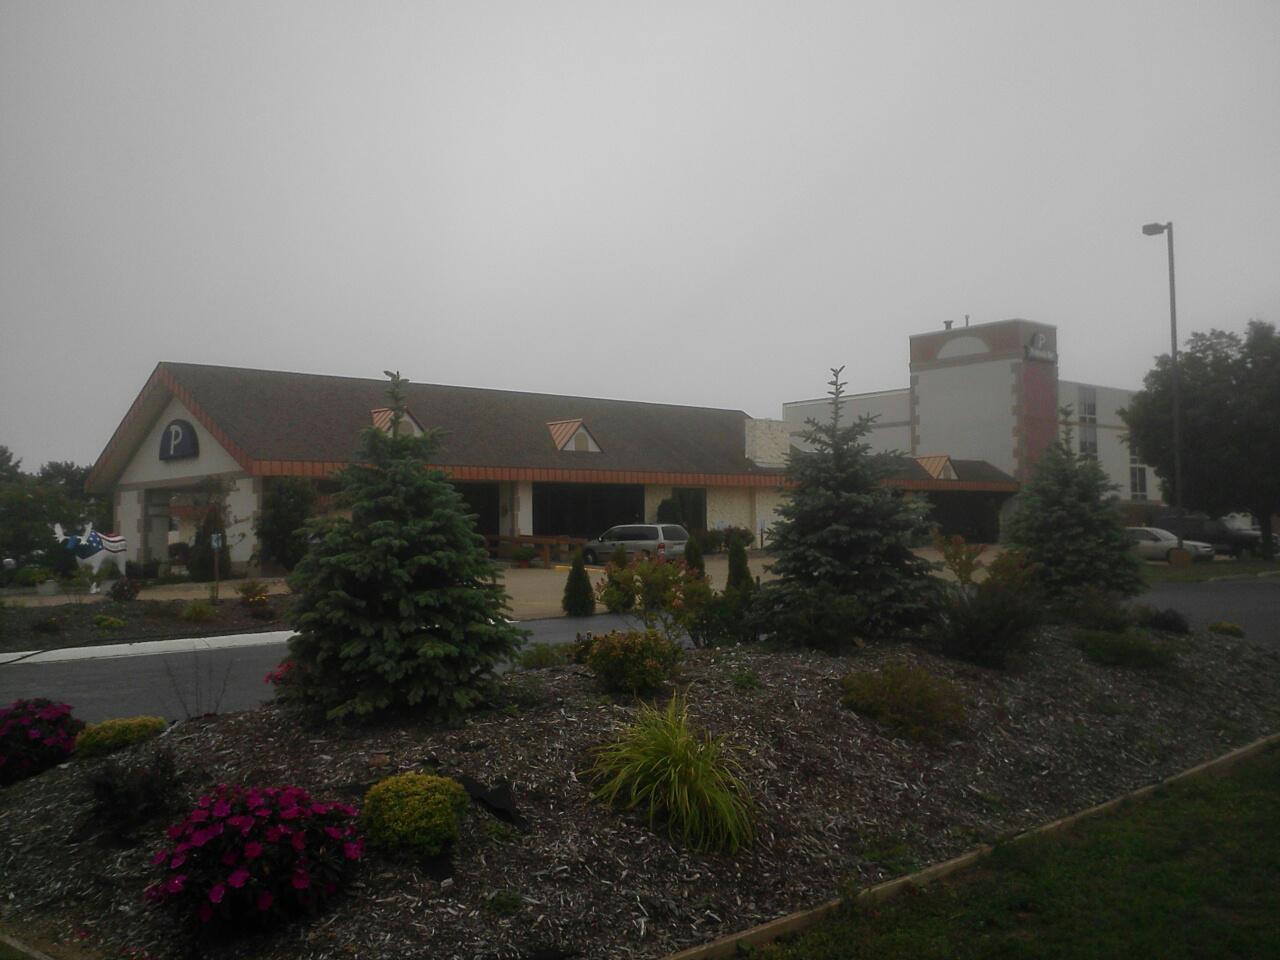 Peninsula Bay Inn, Escanaba MI